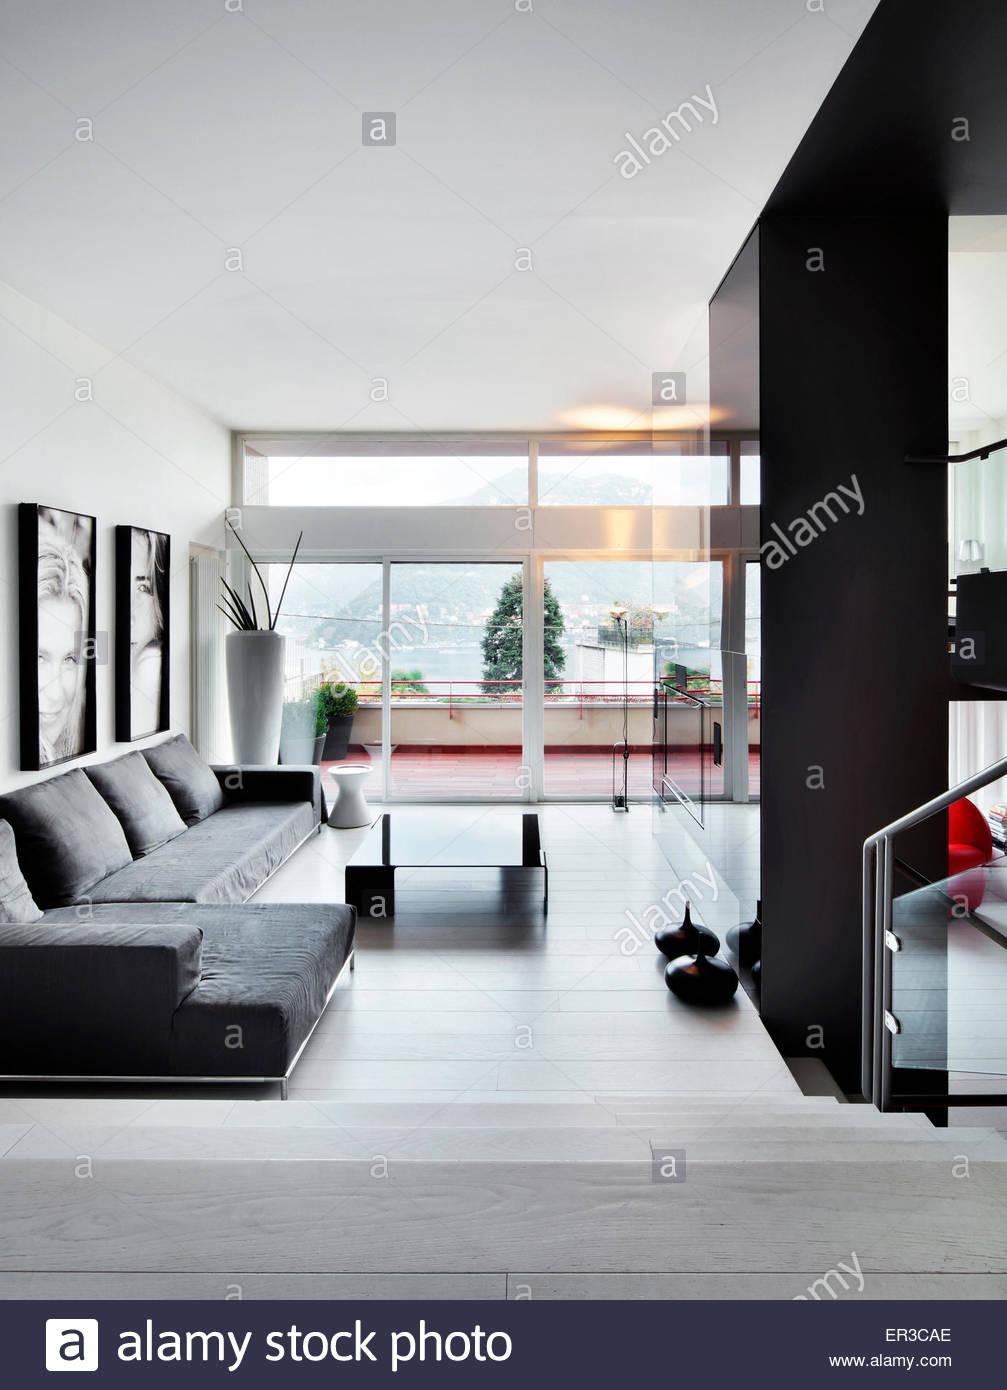 Split Level Living Room In Stock Photos & Split Level Living Room In ...